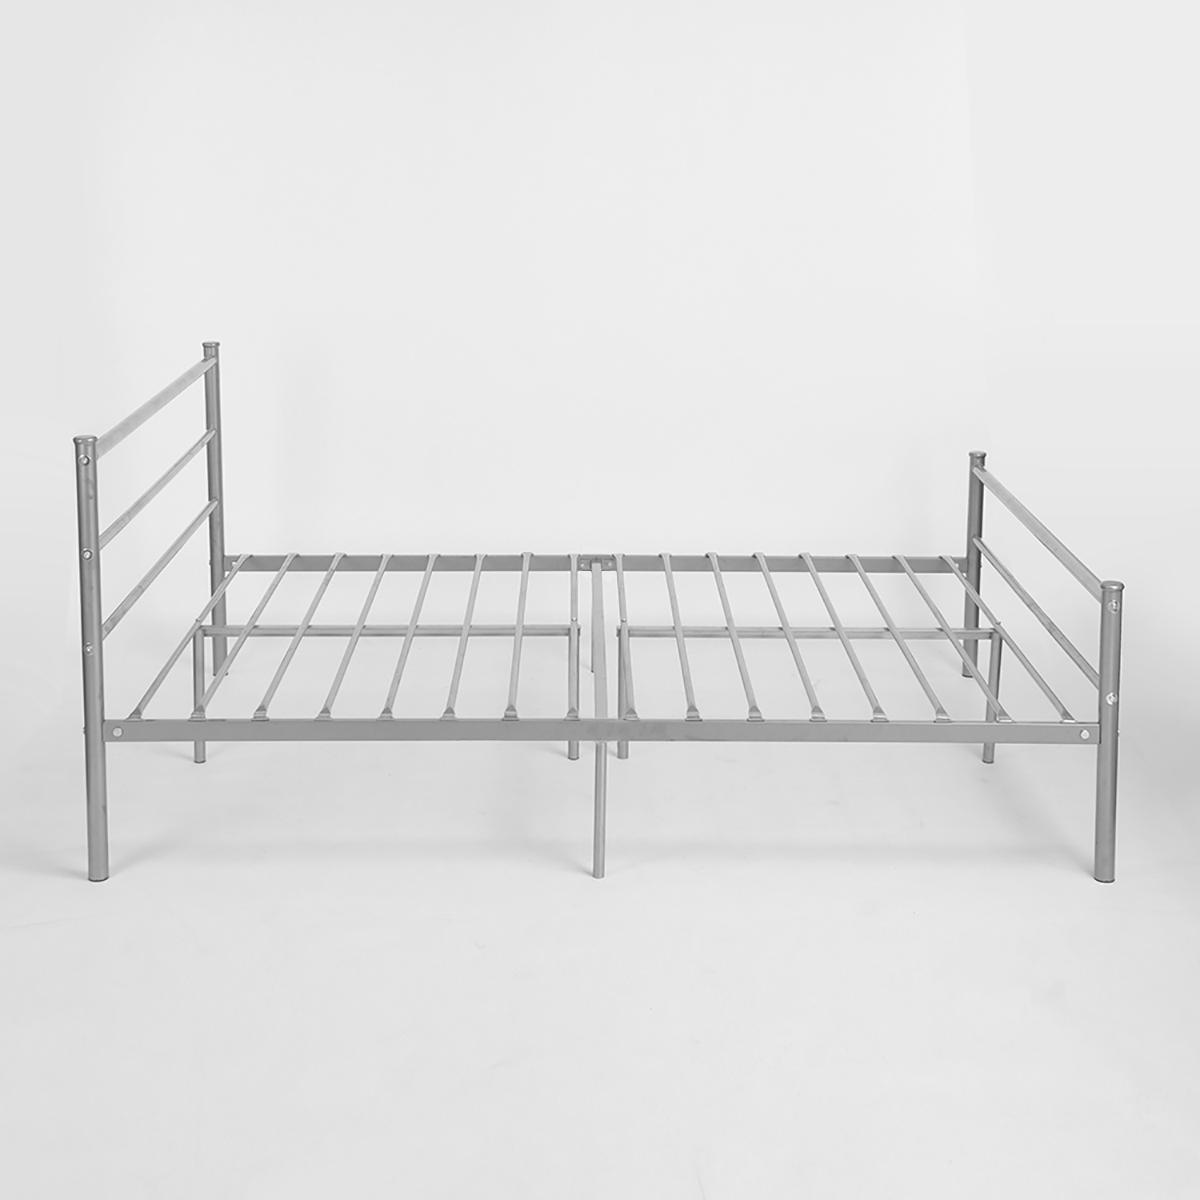 EGGREE Metal Double Bed 4ft 6 Bed Frame Solid Bedstead Base mattress ...